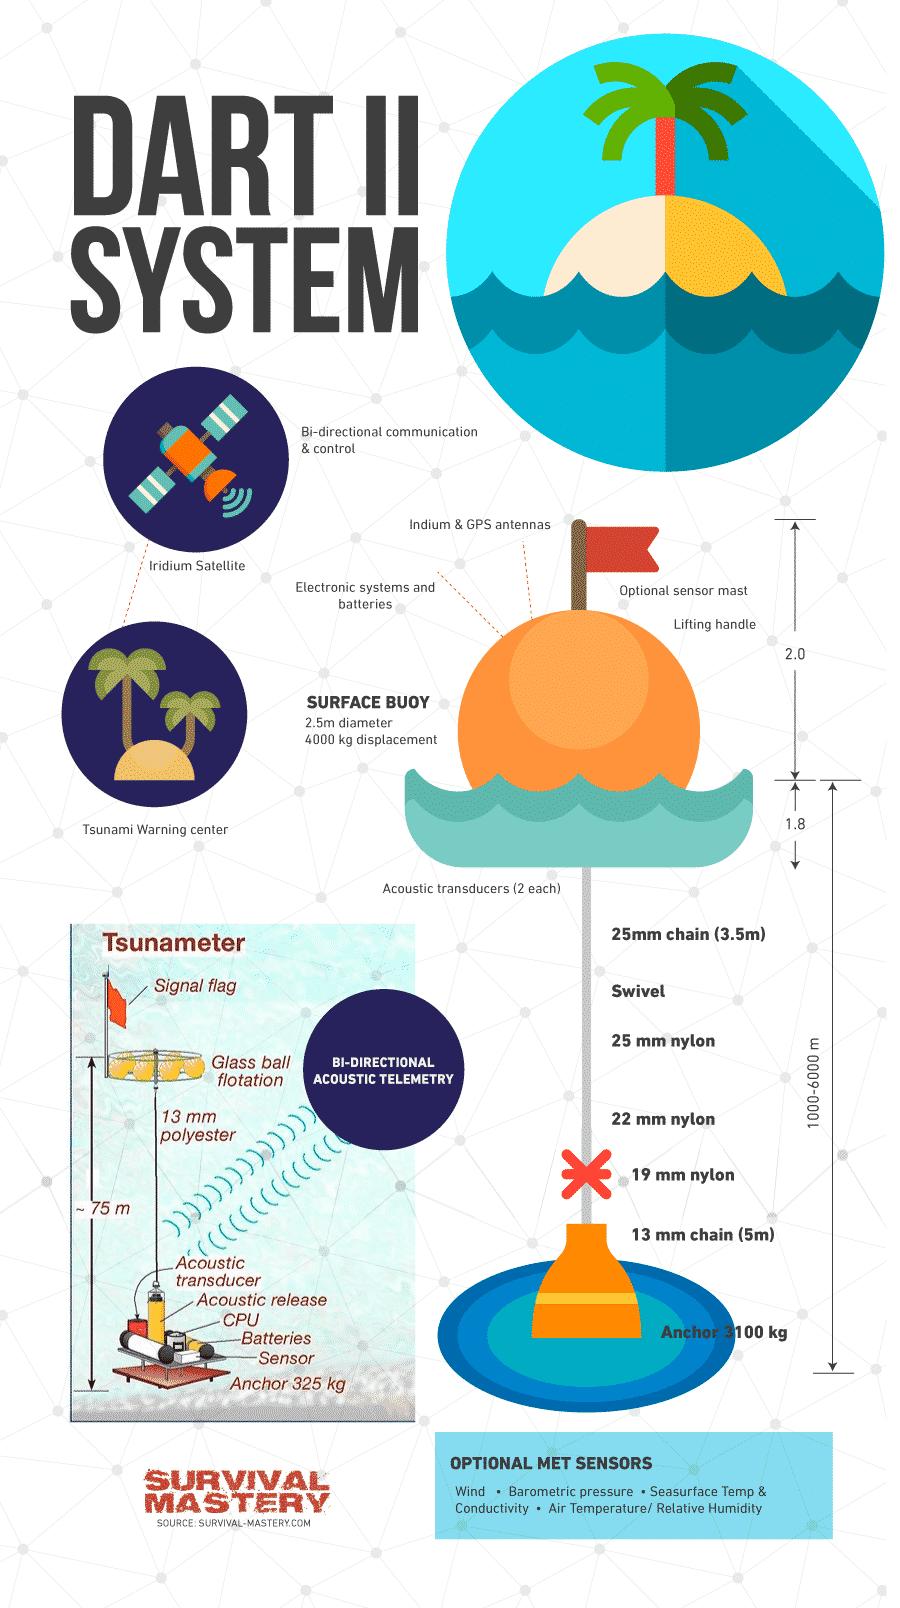 Dart II system infographic